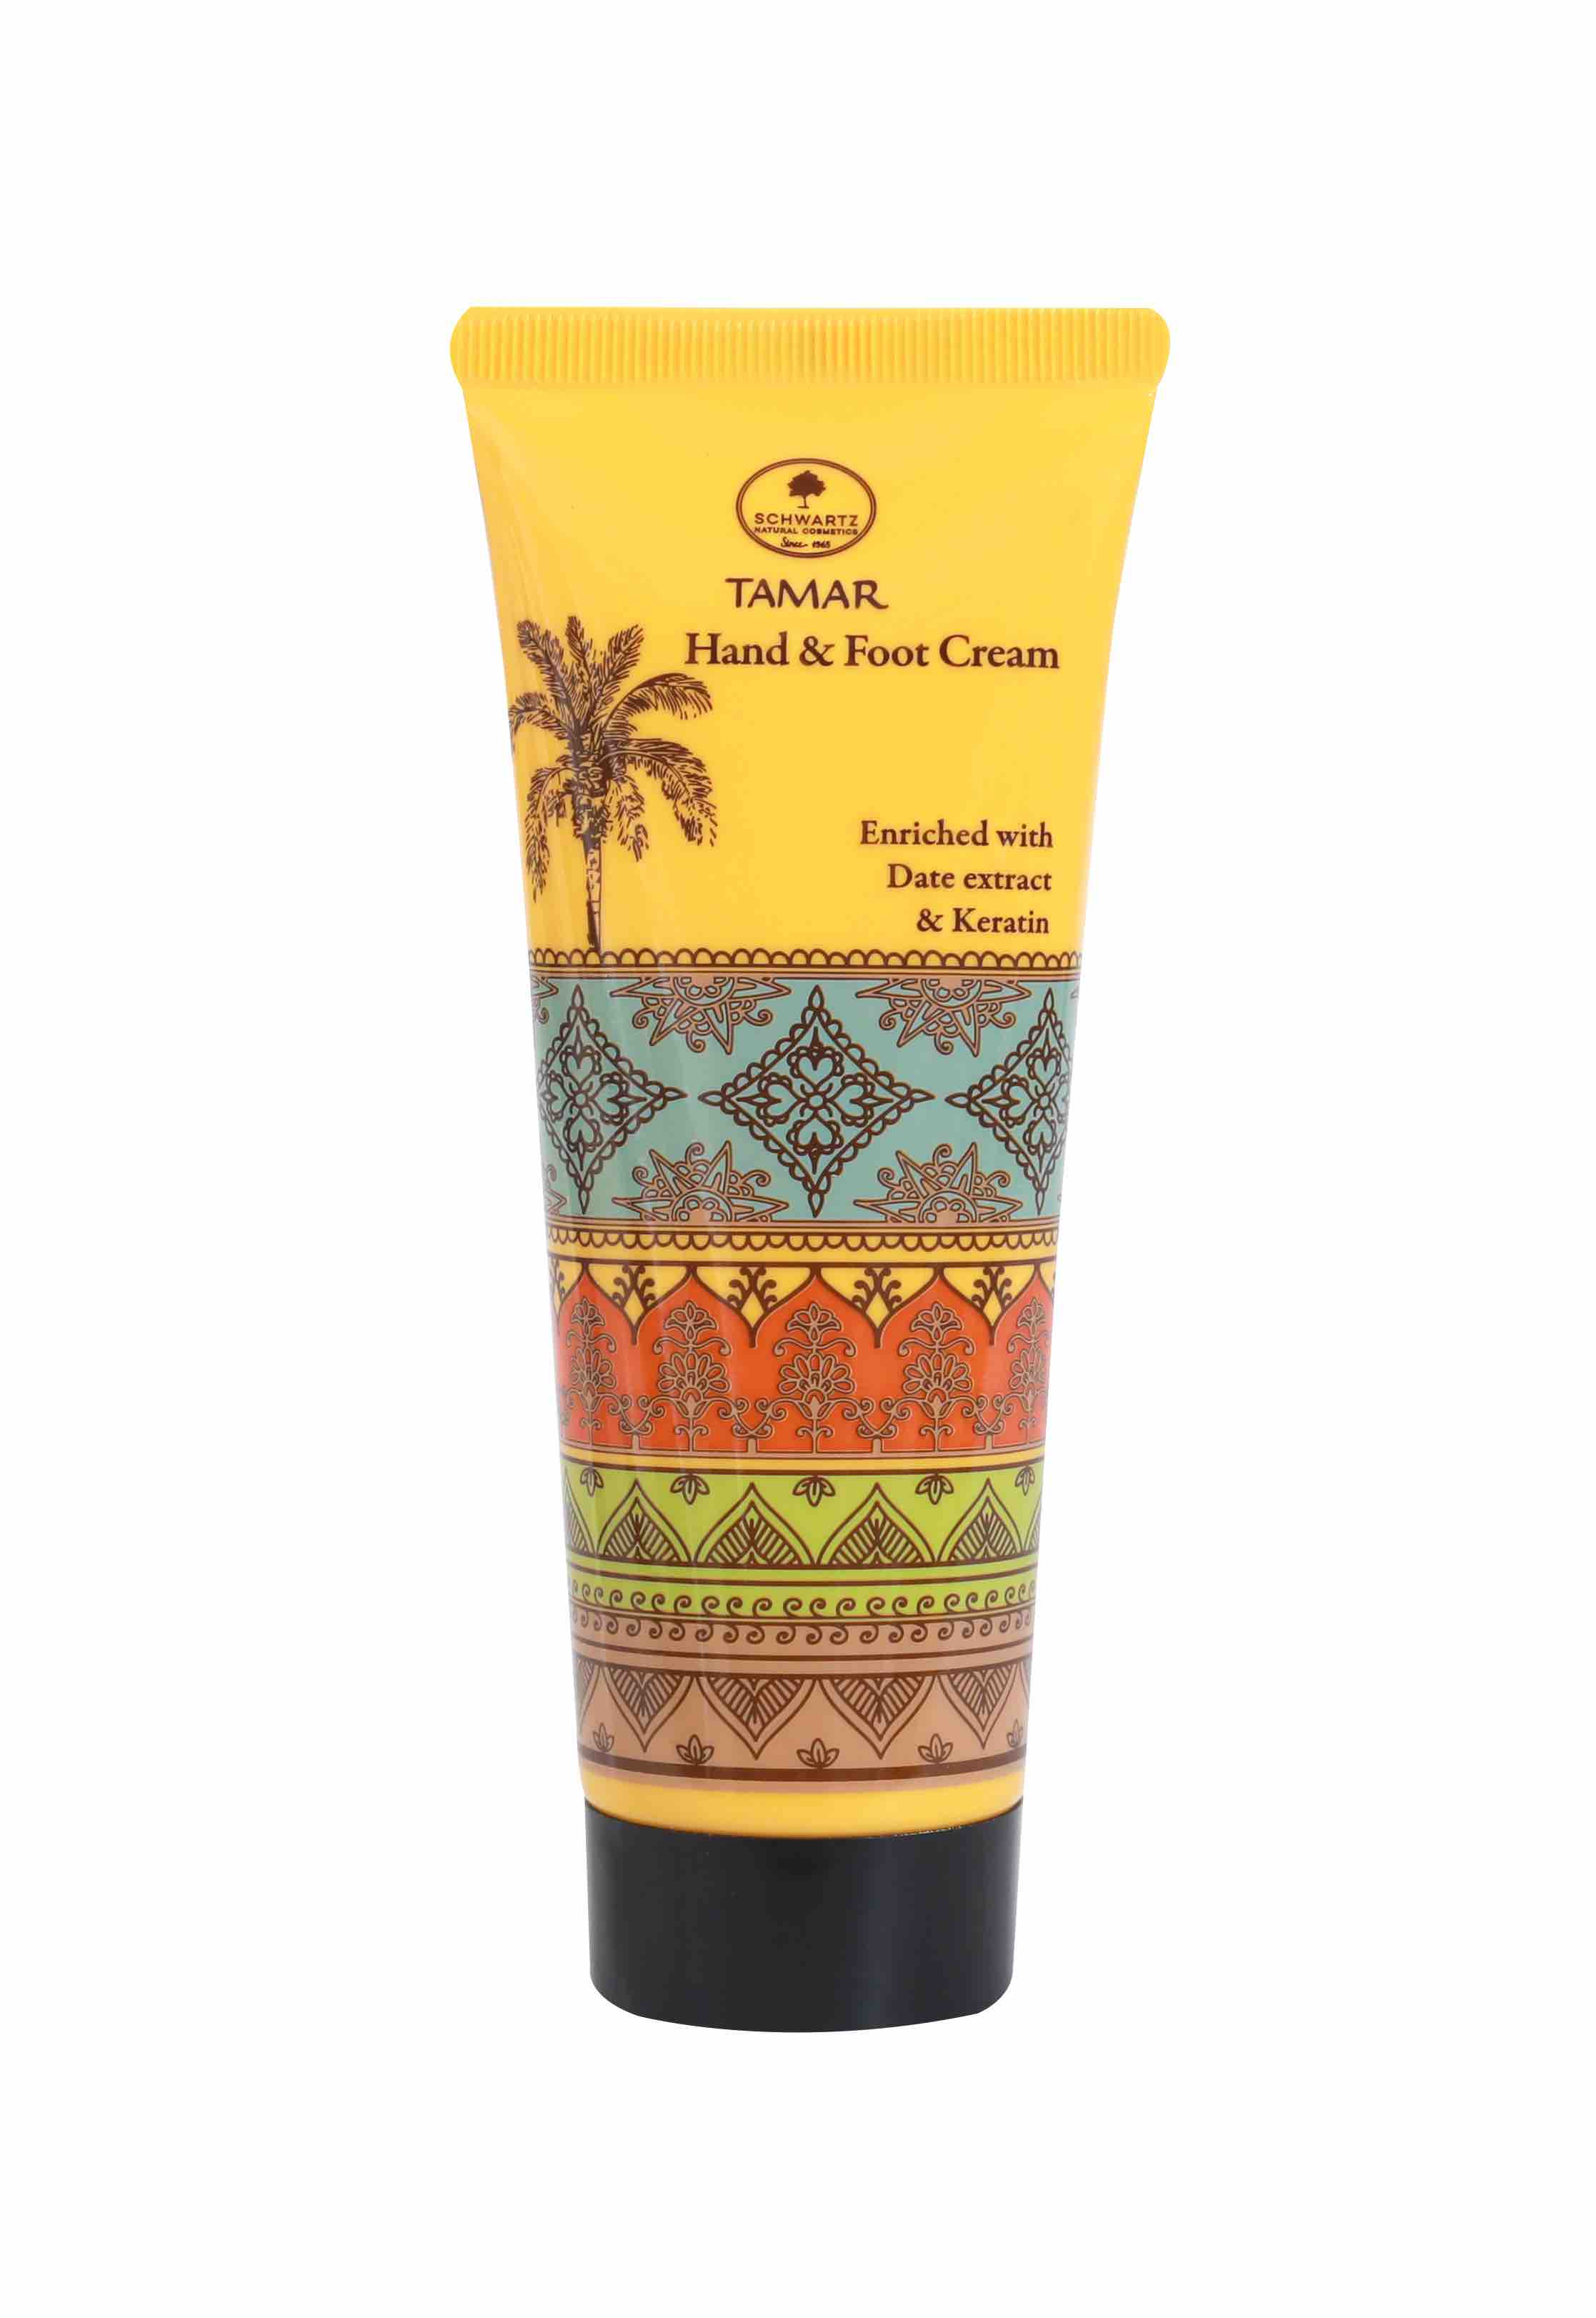 Tamar hand cream